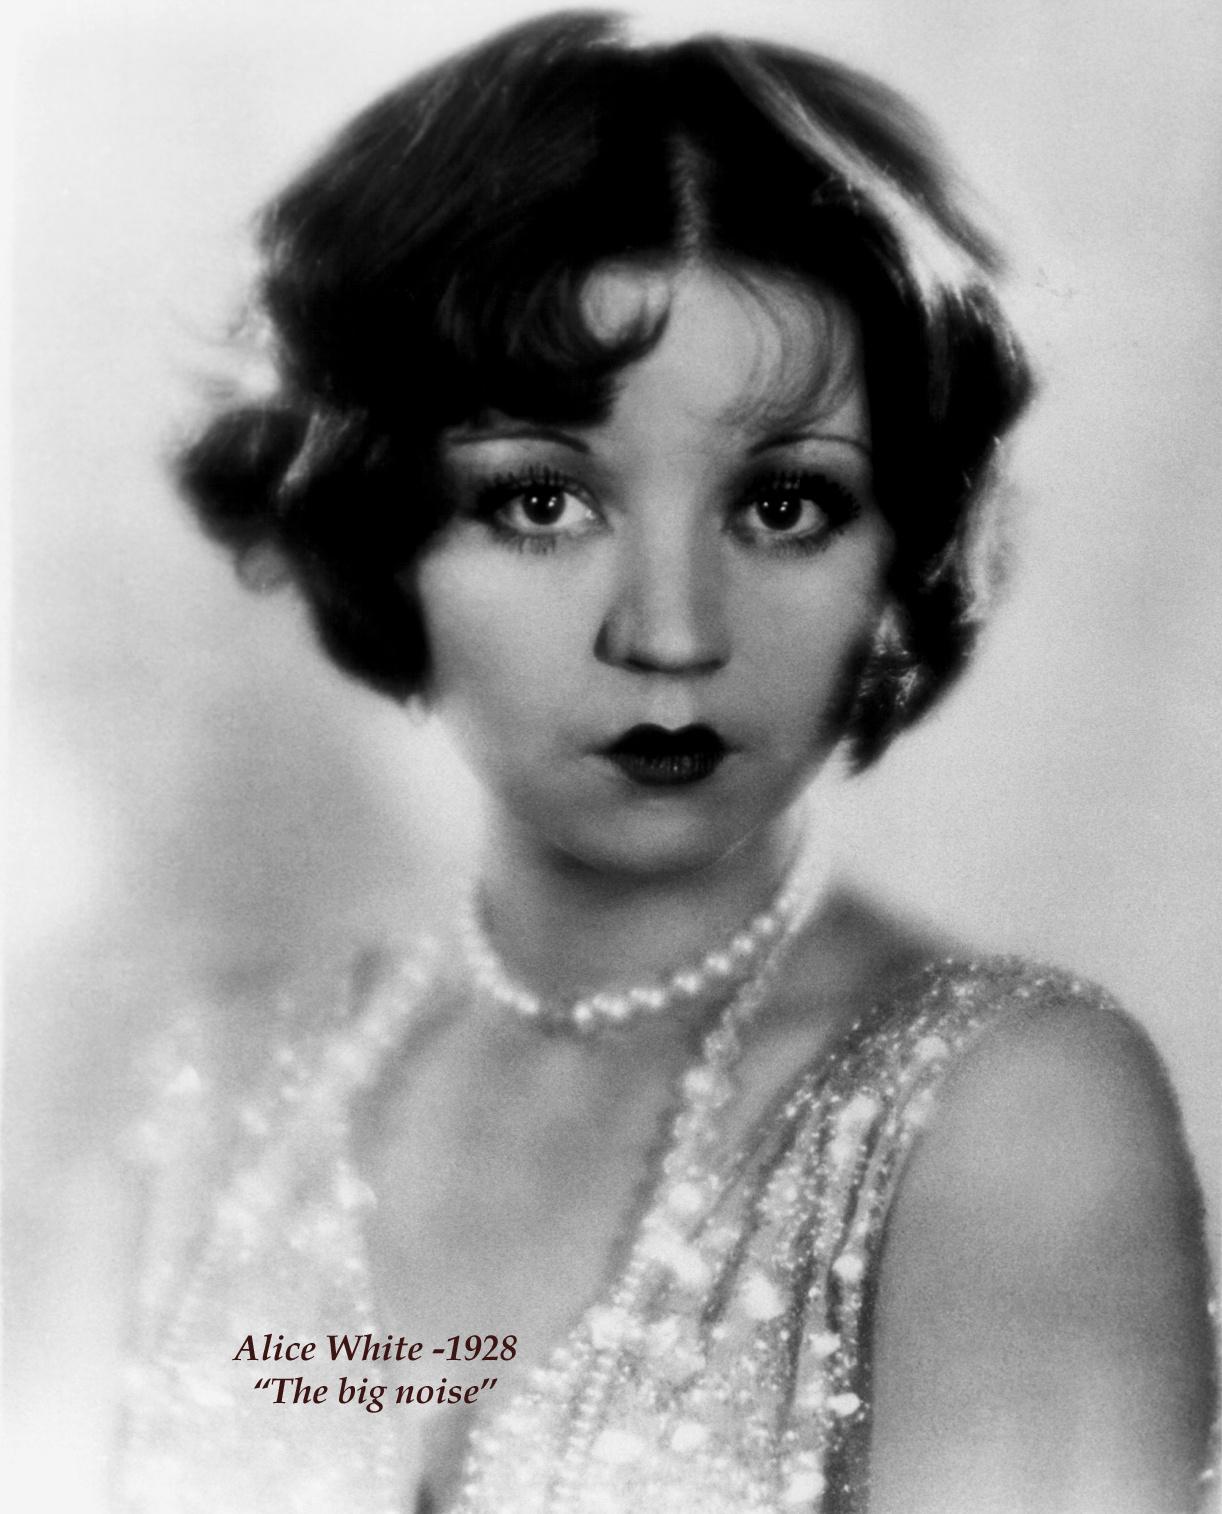 Alice White-